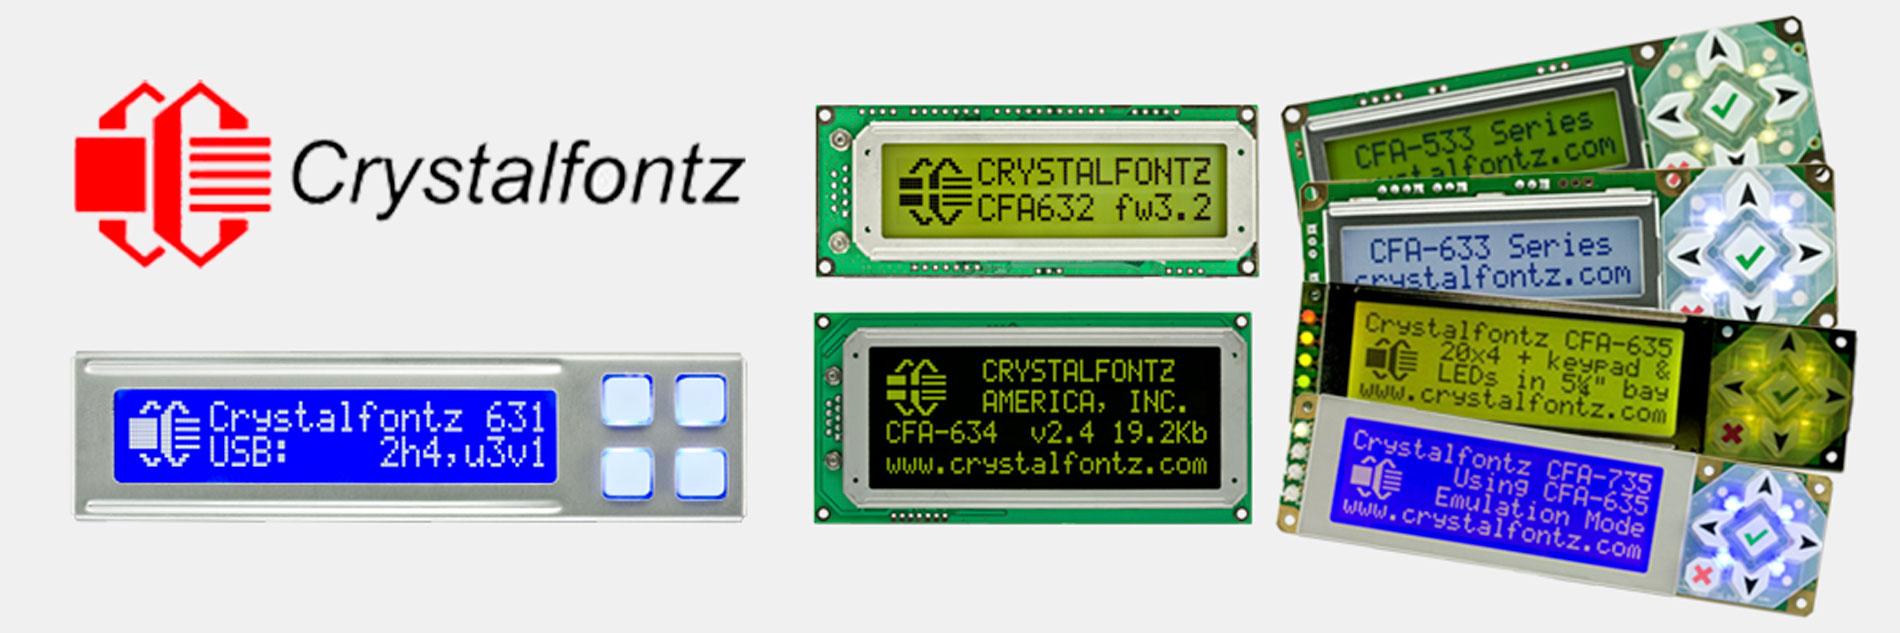 Crystalfontz Intelligent Display Module